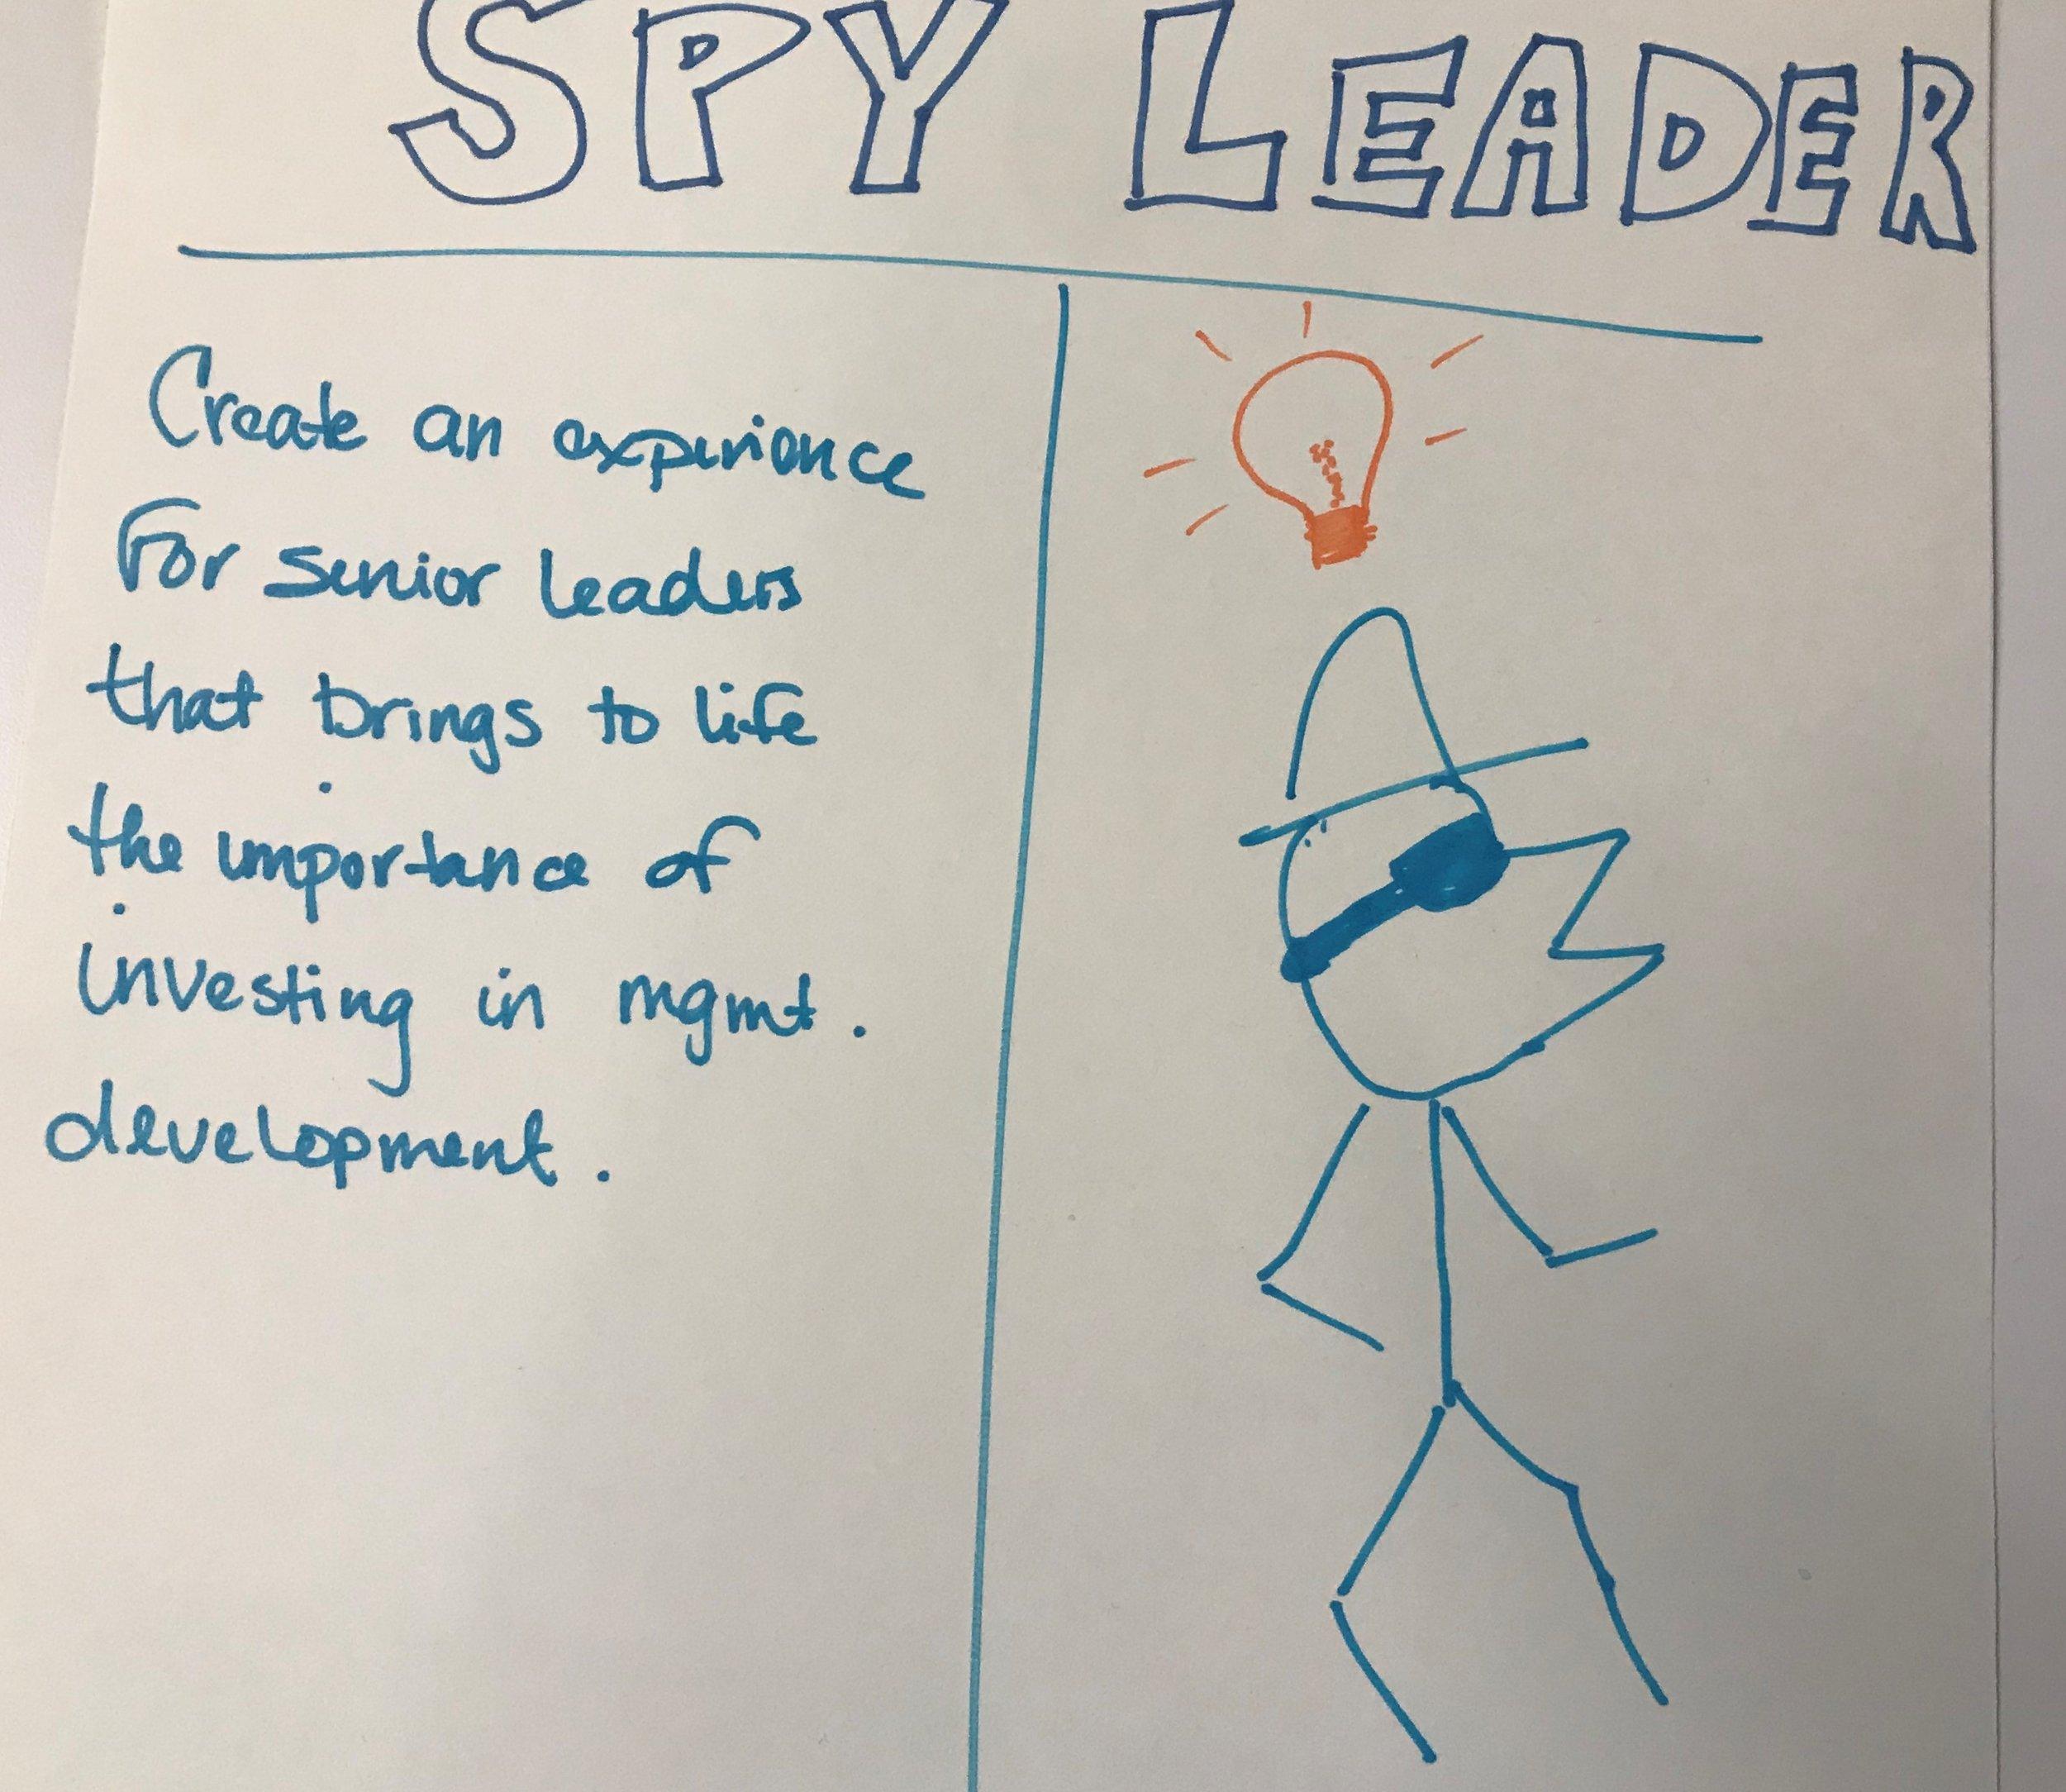 Spy Leader